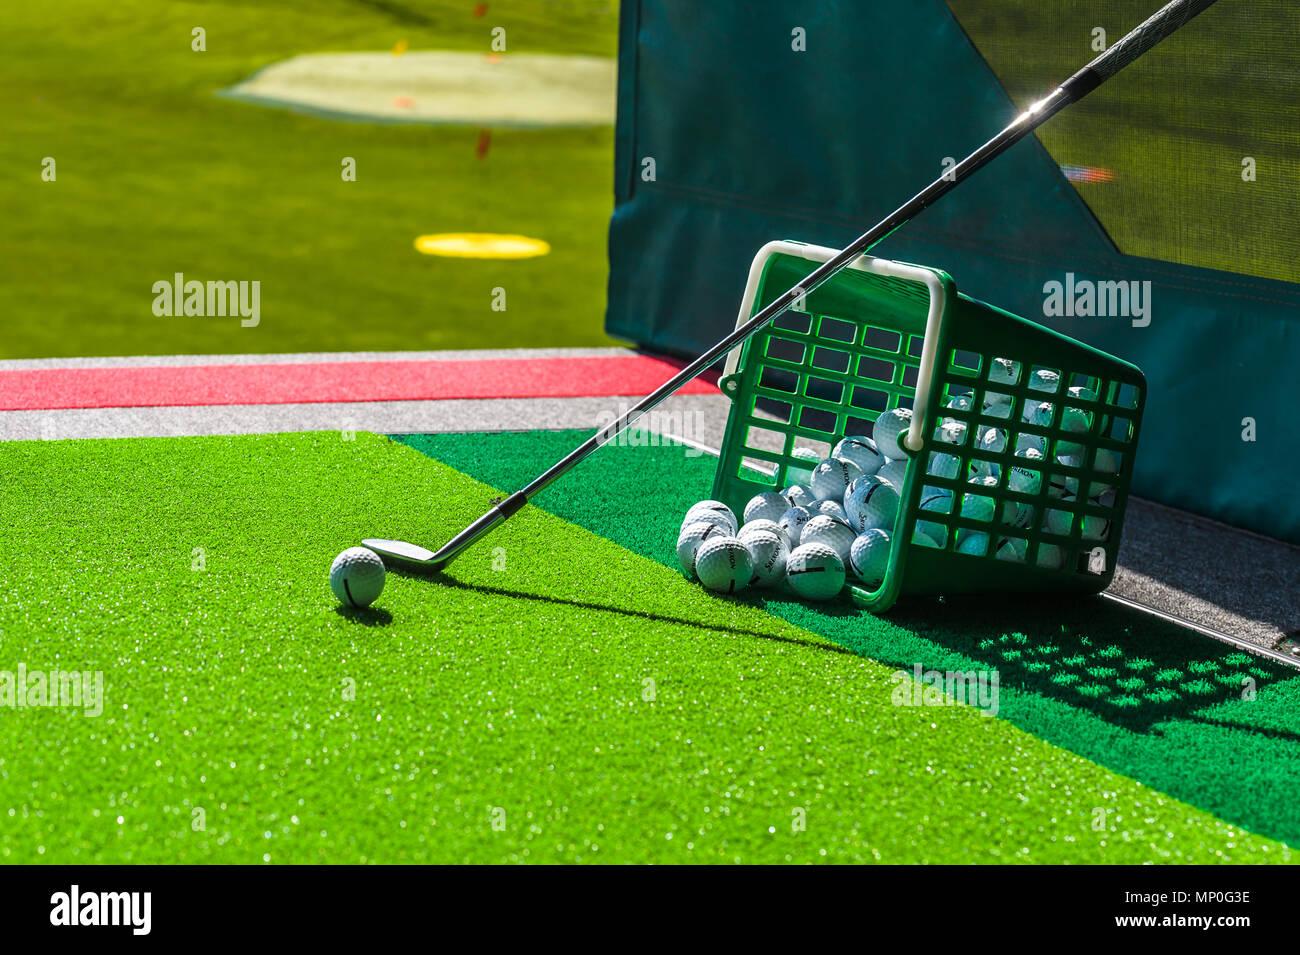 Golf balls, basket of balls & Golf clubs at driving range images - Stock Image